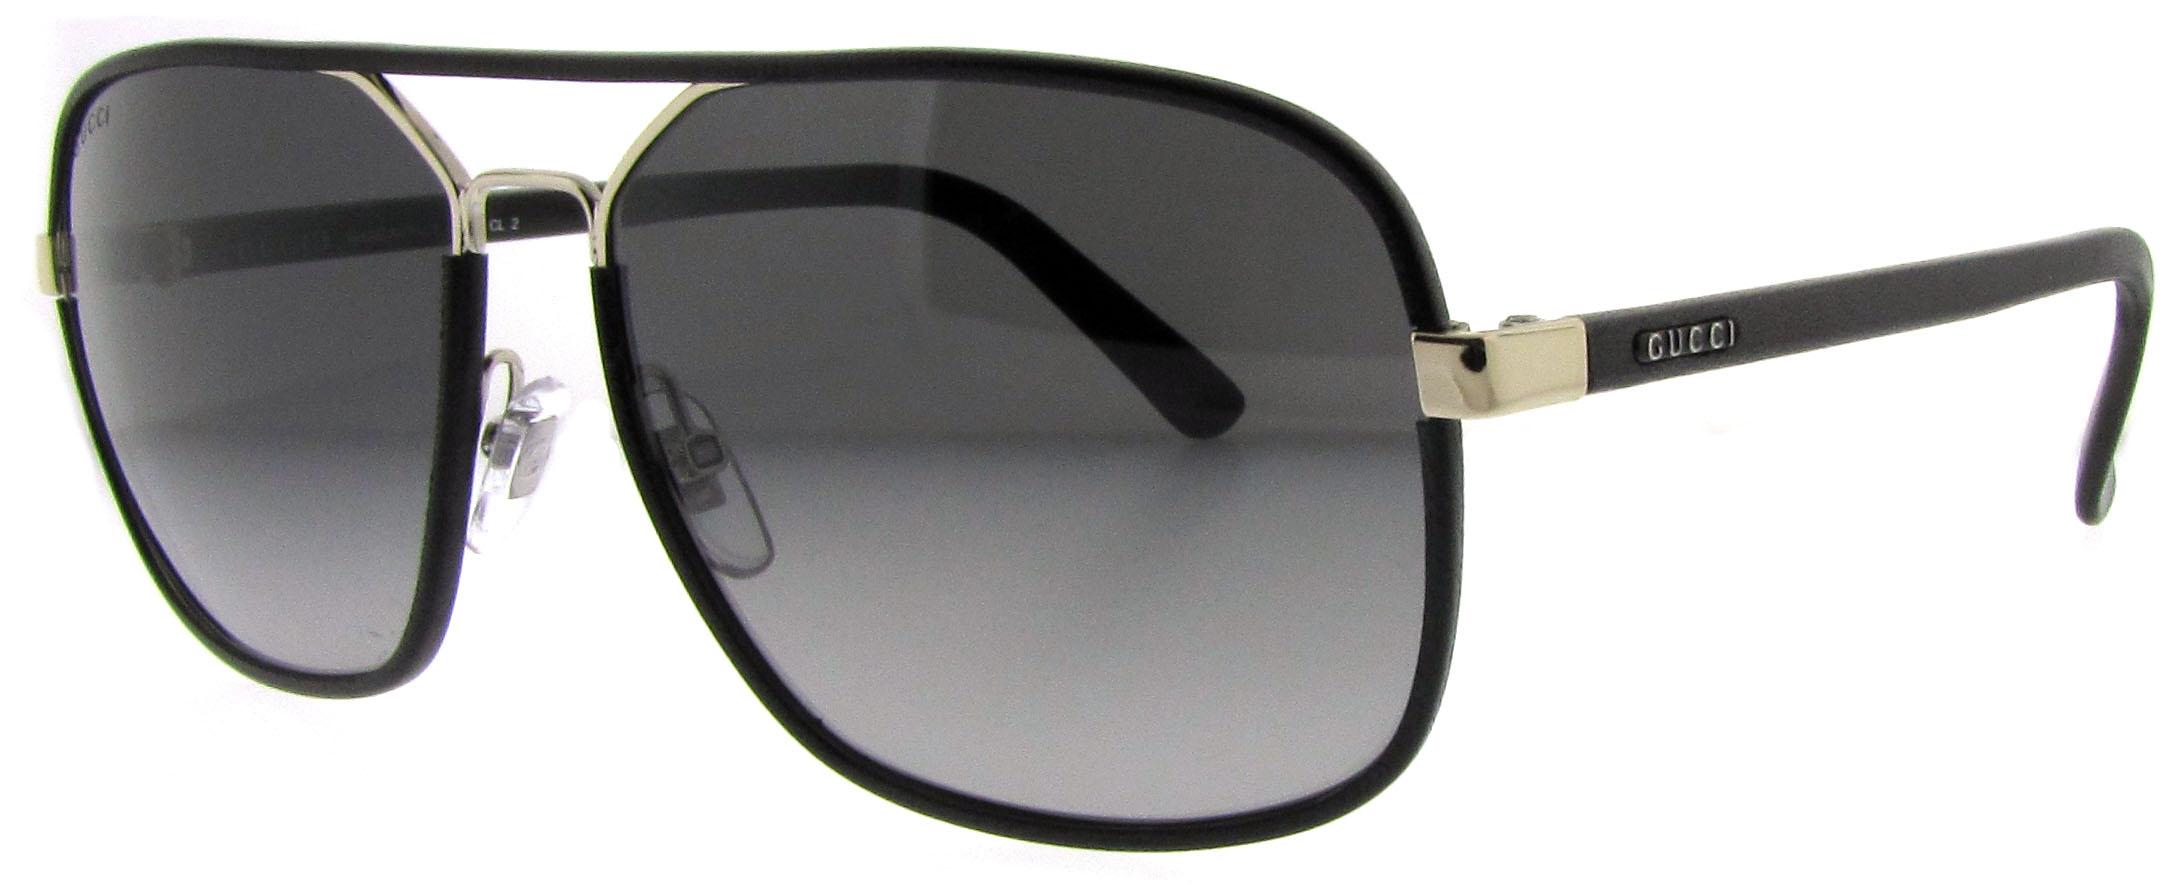 Gucci Sunglasses Leather Frame Aviator : Gucci GG 1943 s UZA Black Leather Aviator Sunglasses eBay